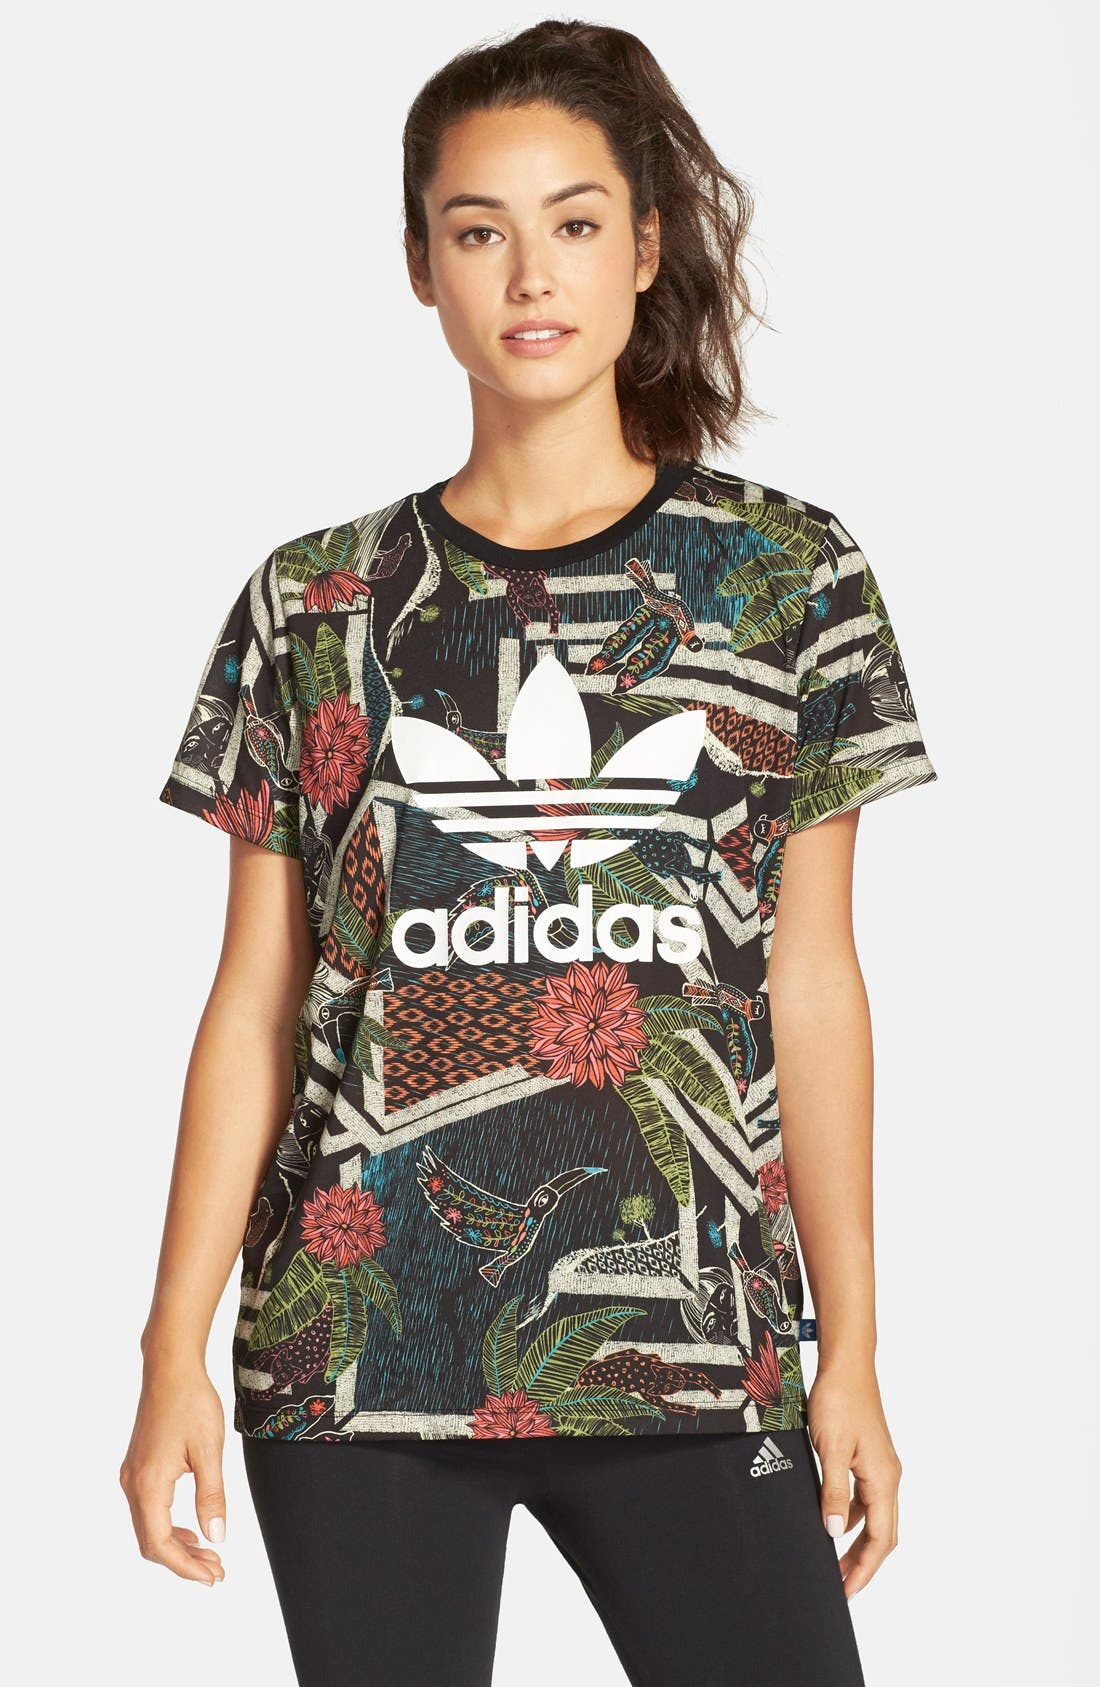 Alternate Image 1 Selected - adidas 'Xilofloresta' Logo Print Jersey Tee